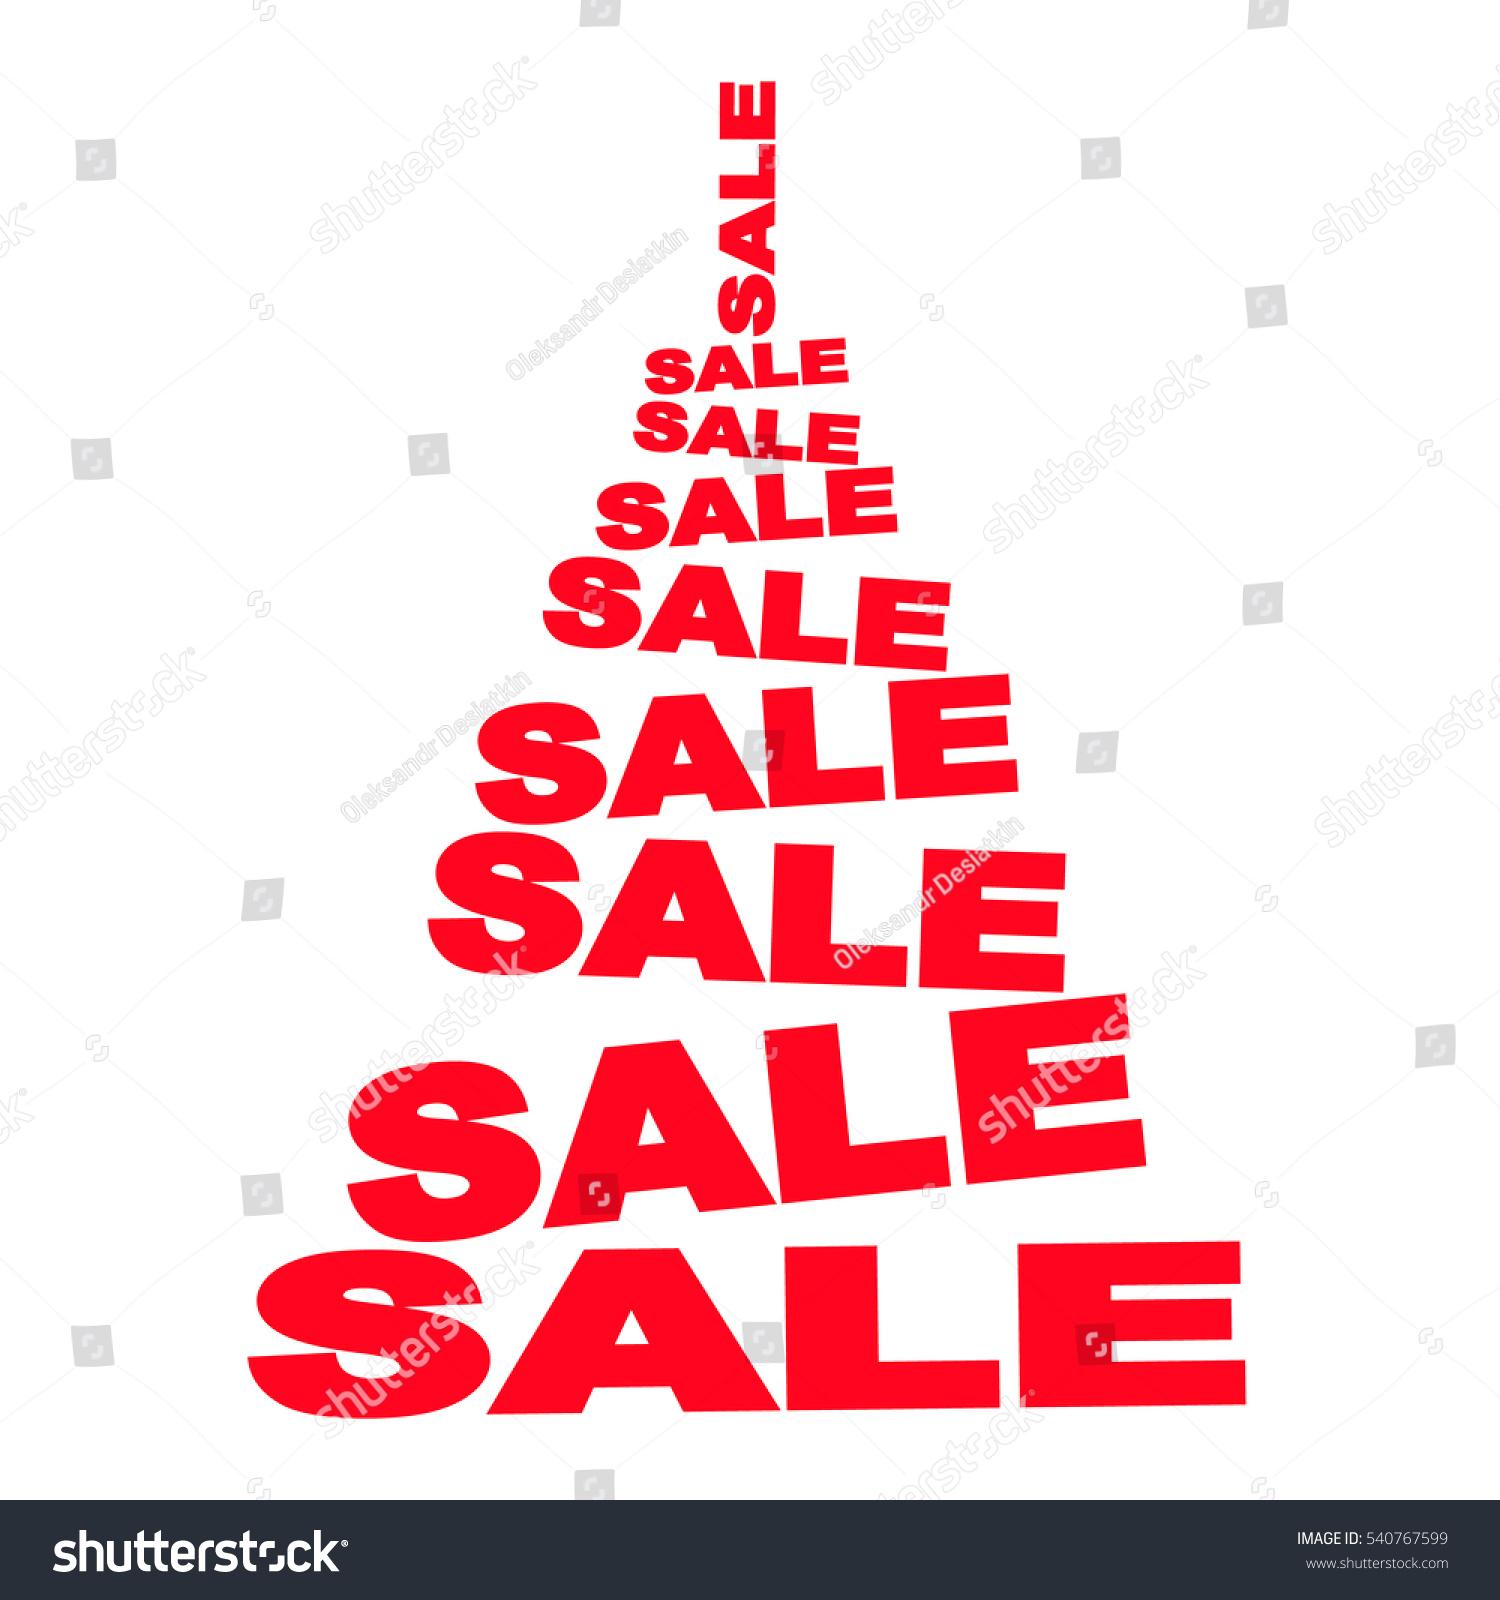 Christmas Sale 2017 Concept Abstract Christmas Stock Vector  - Red Christmas Tree For Sale